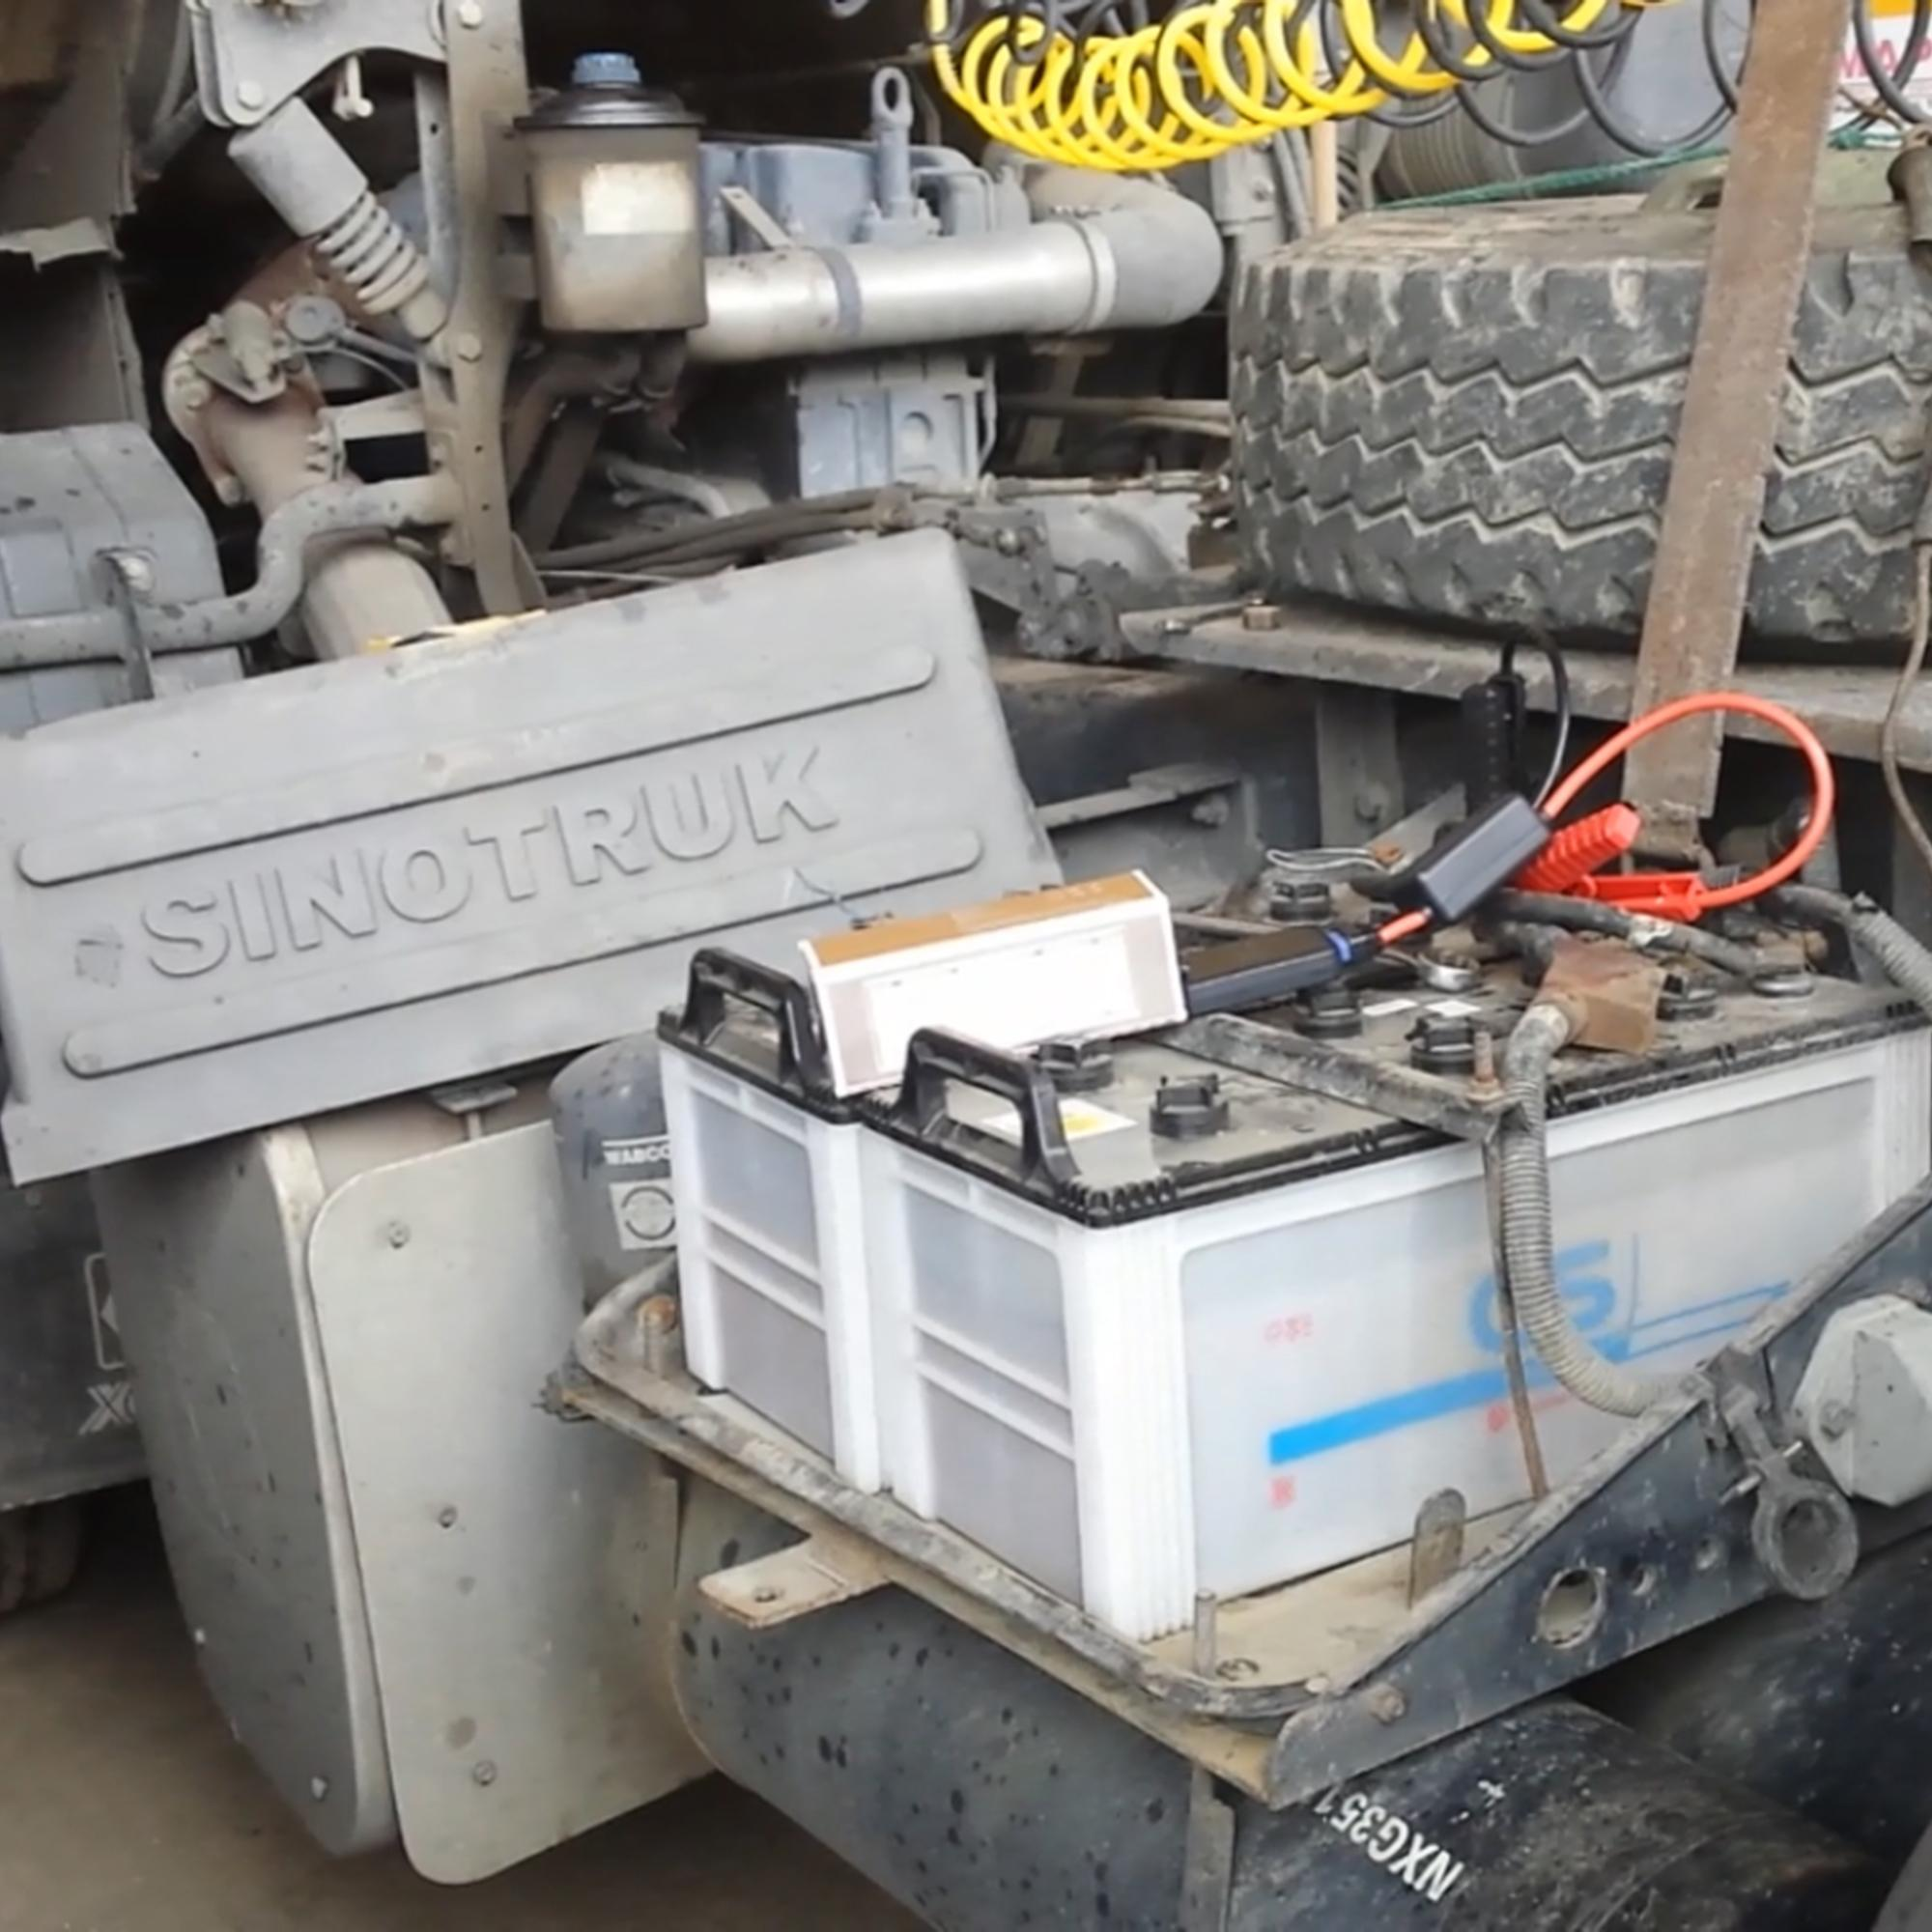 Car Battery Charger For Sale Jump Starter Online Brands Prices Reverse Polarity Protection Gulen Gl10 Gold Heavy Duty 12v 24v Portable Truck Power